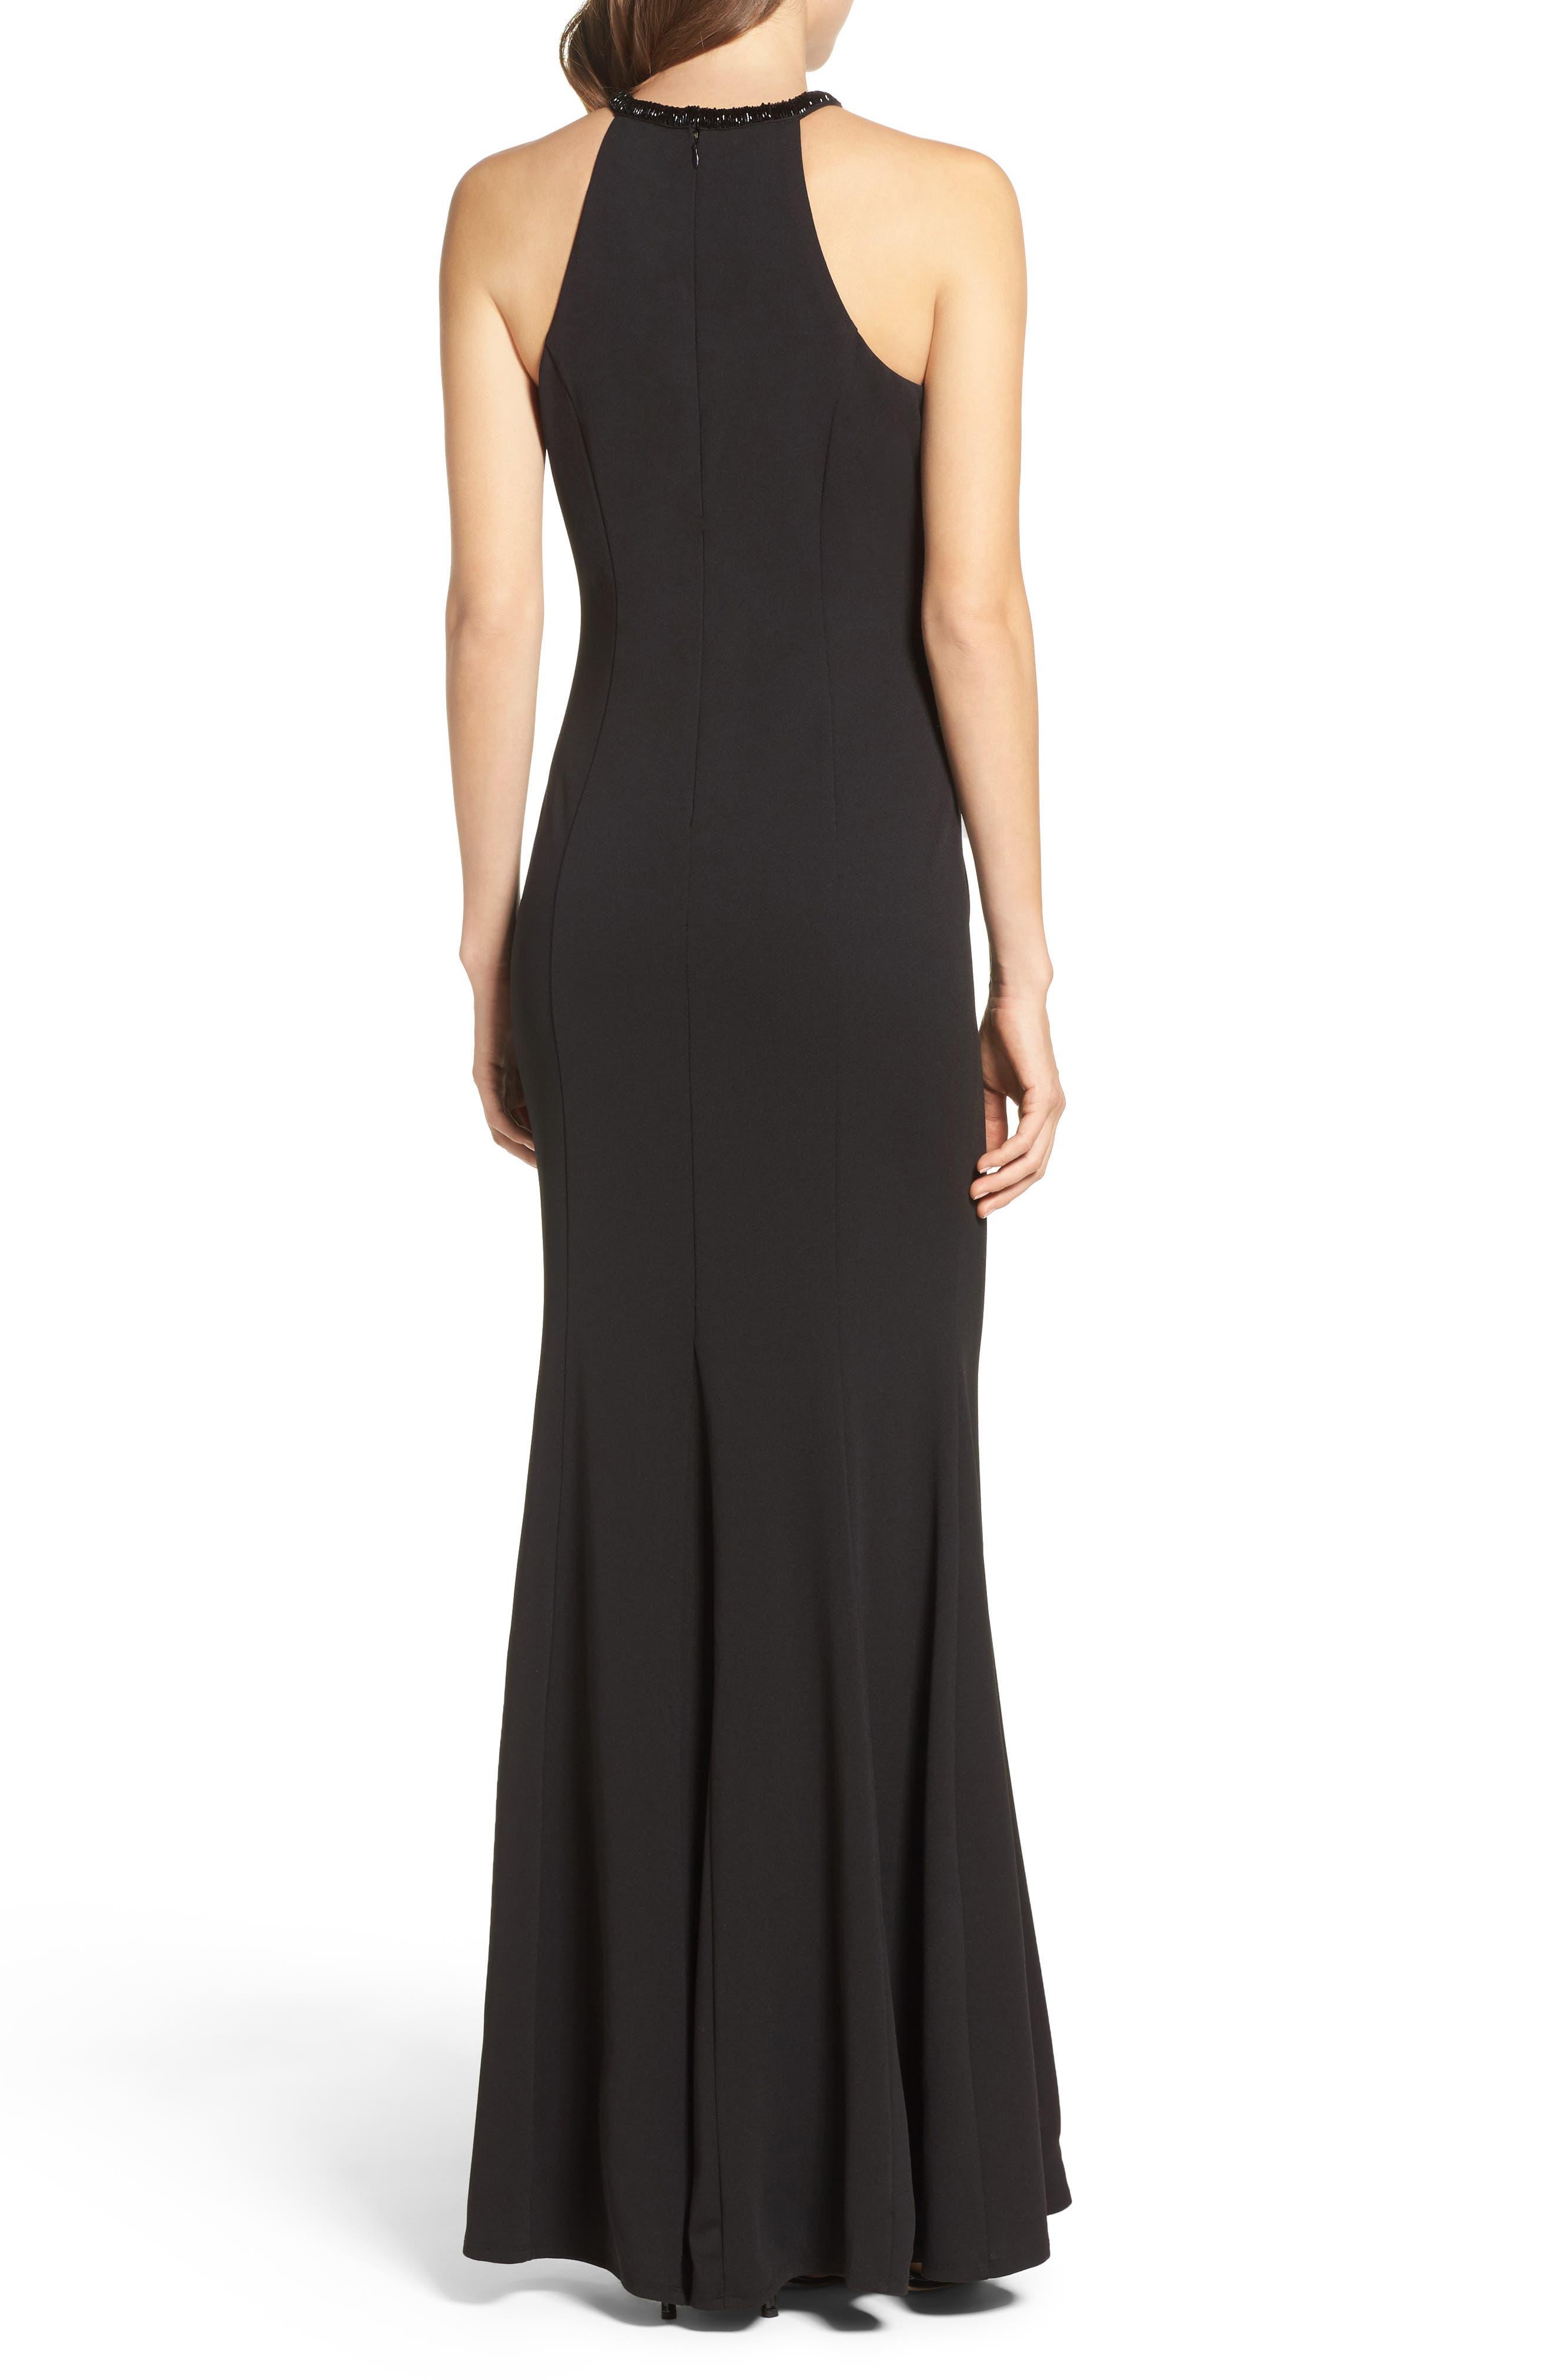 LULUS, Bead Neck Mermaid Gown, Alternate thumbnail 2, color, BLACK